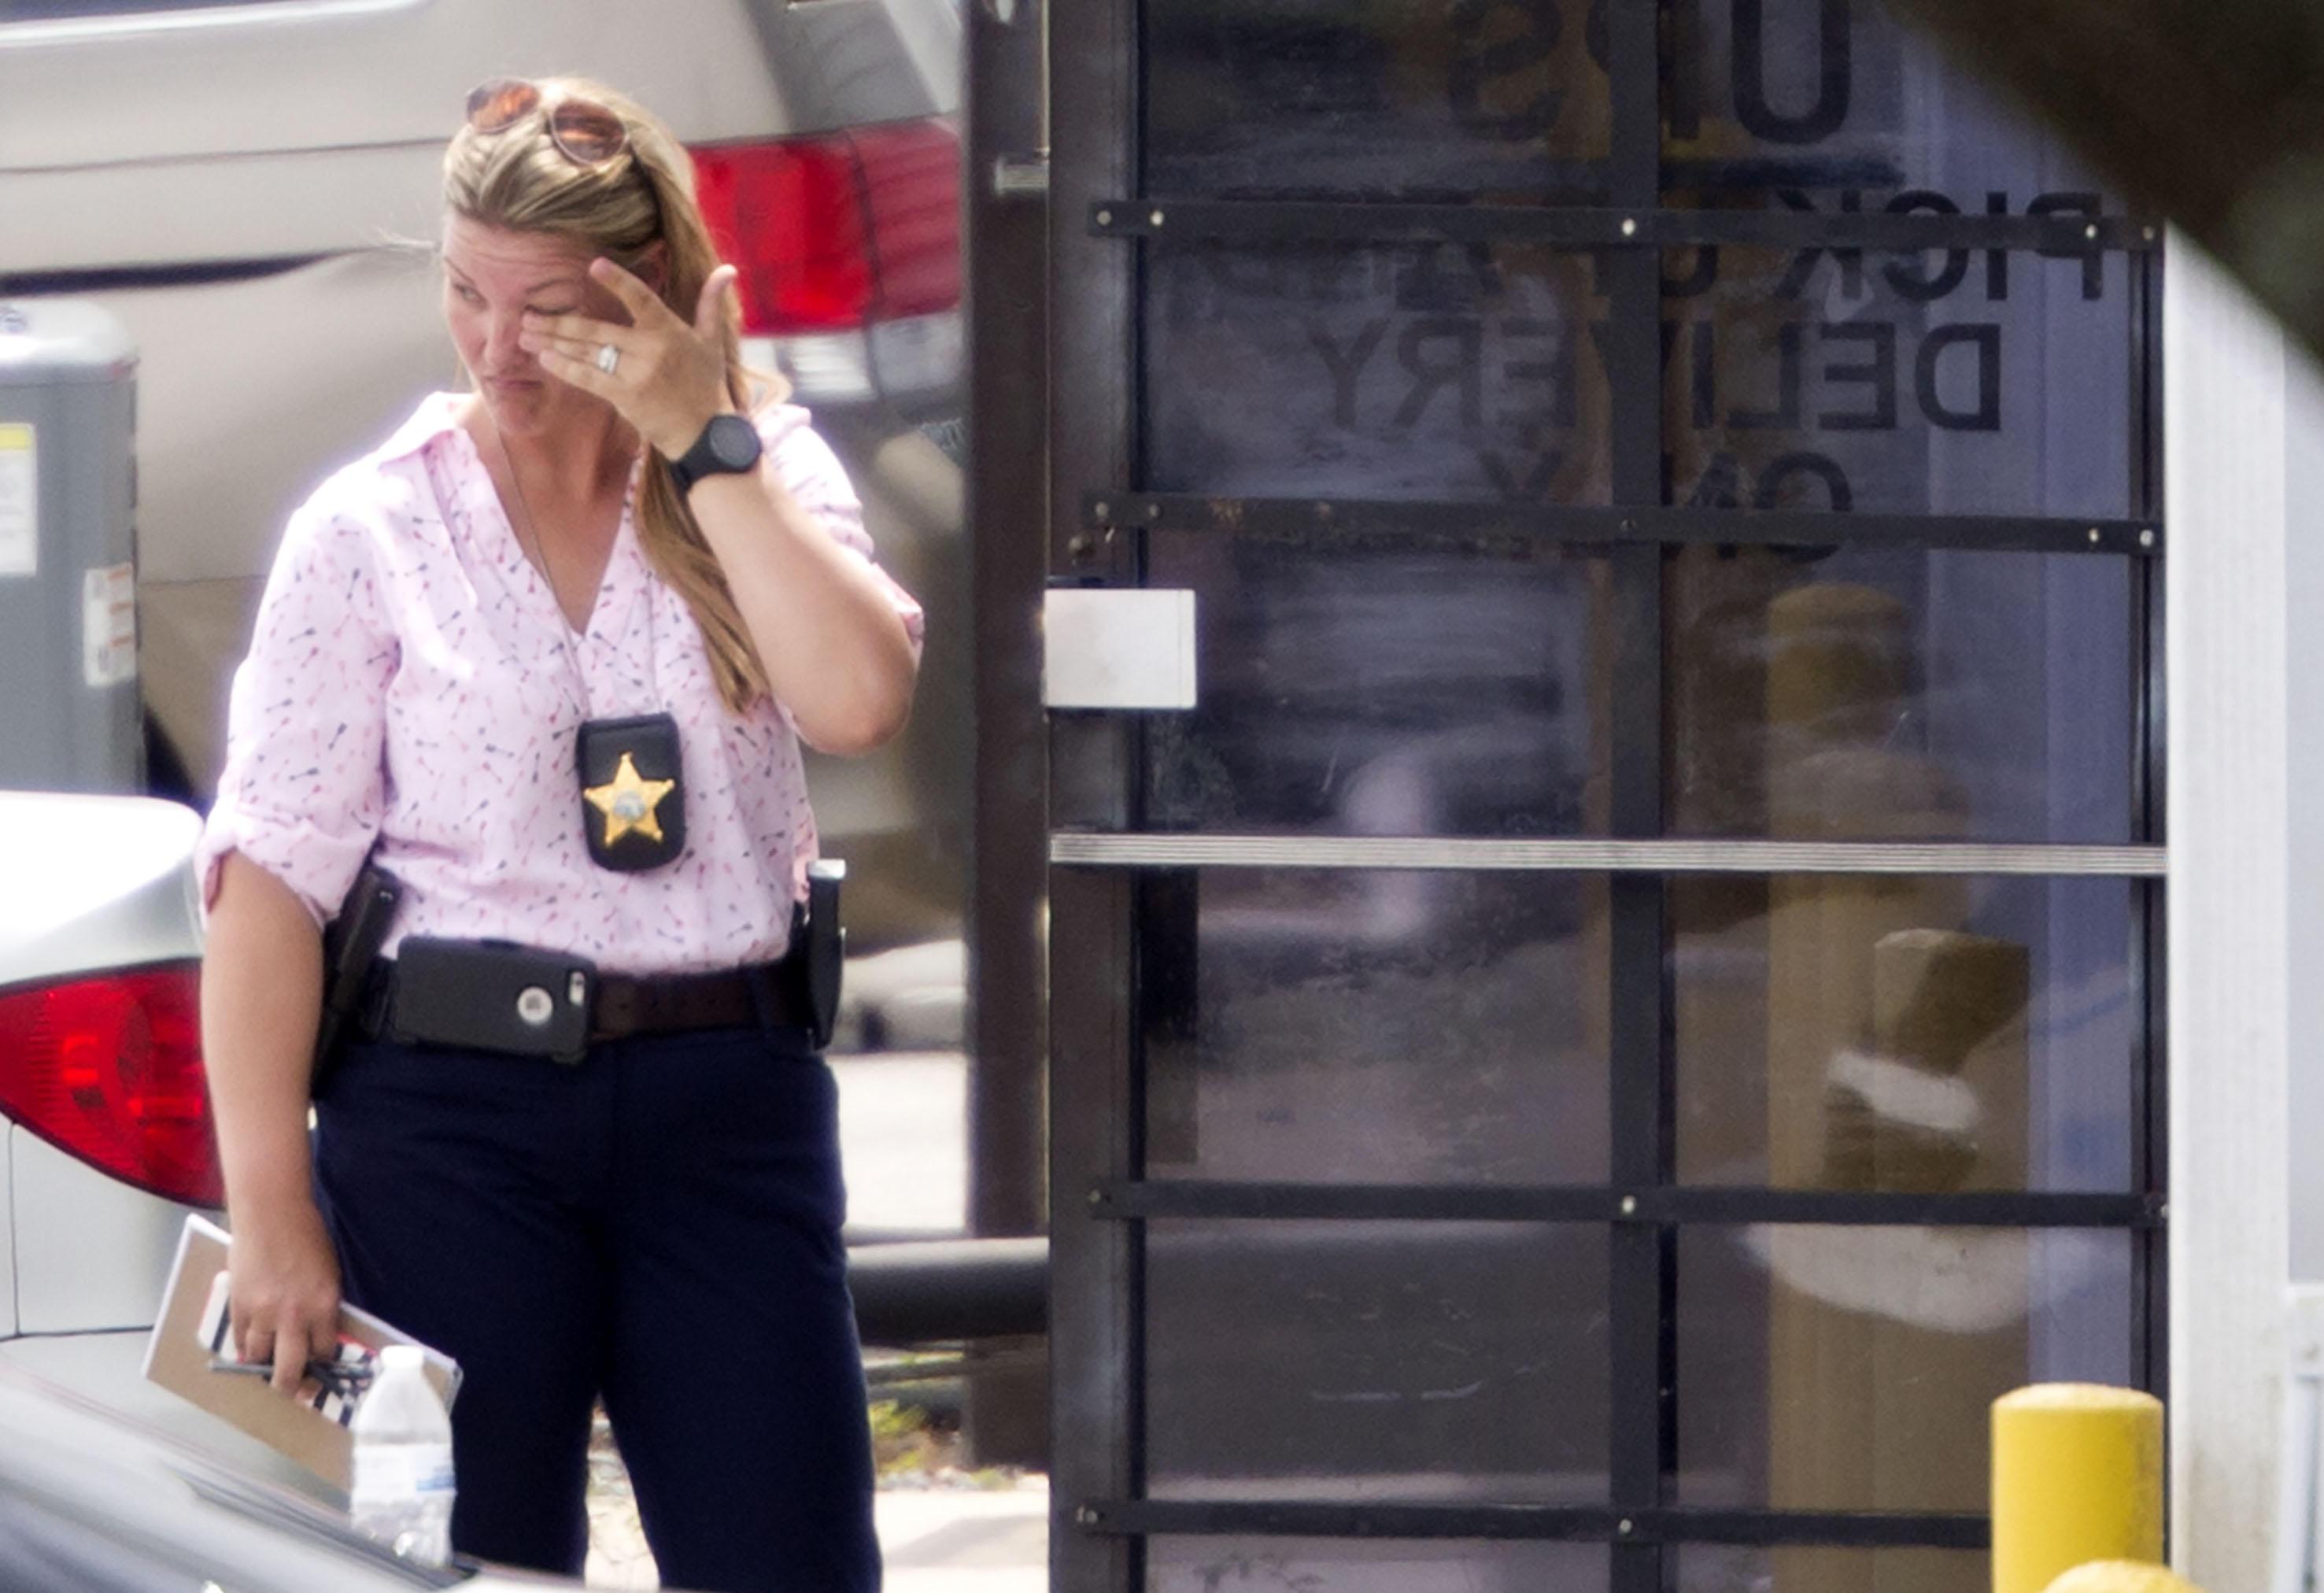 Orlando Shooting Gunman Kills 5 At Former Workplace